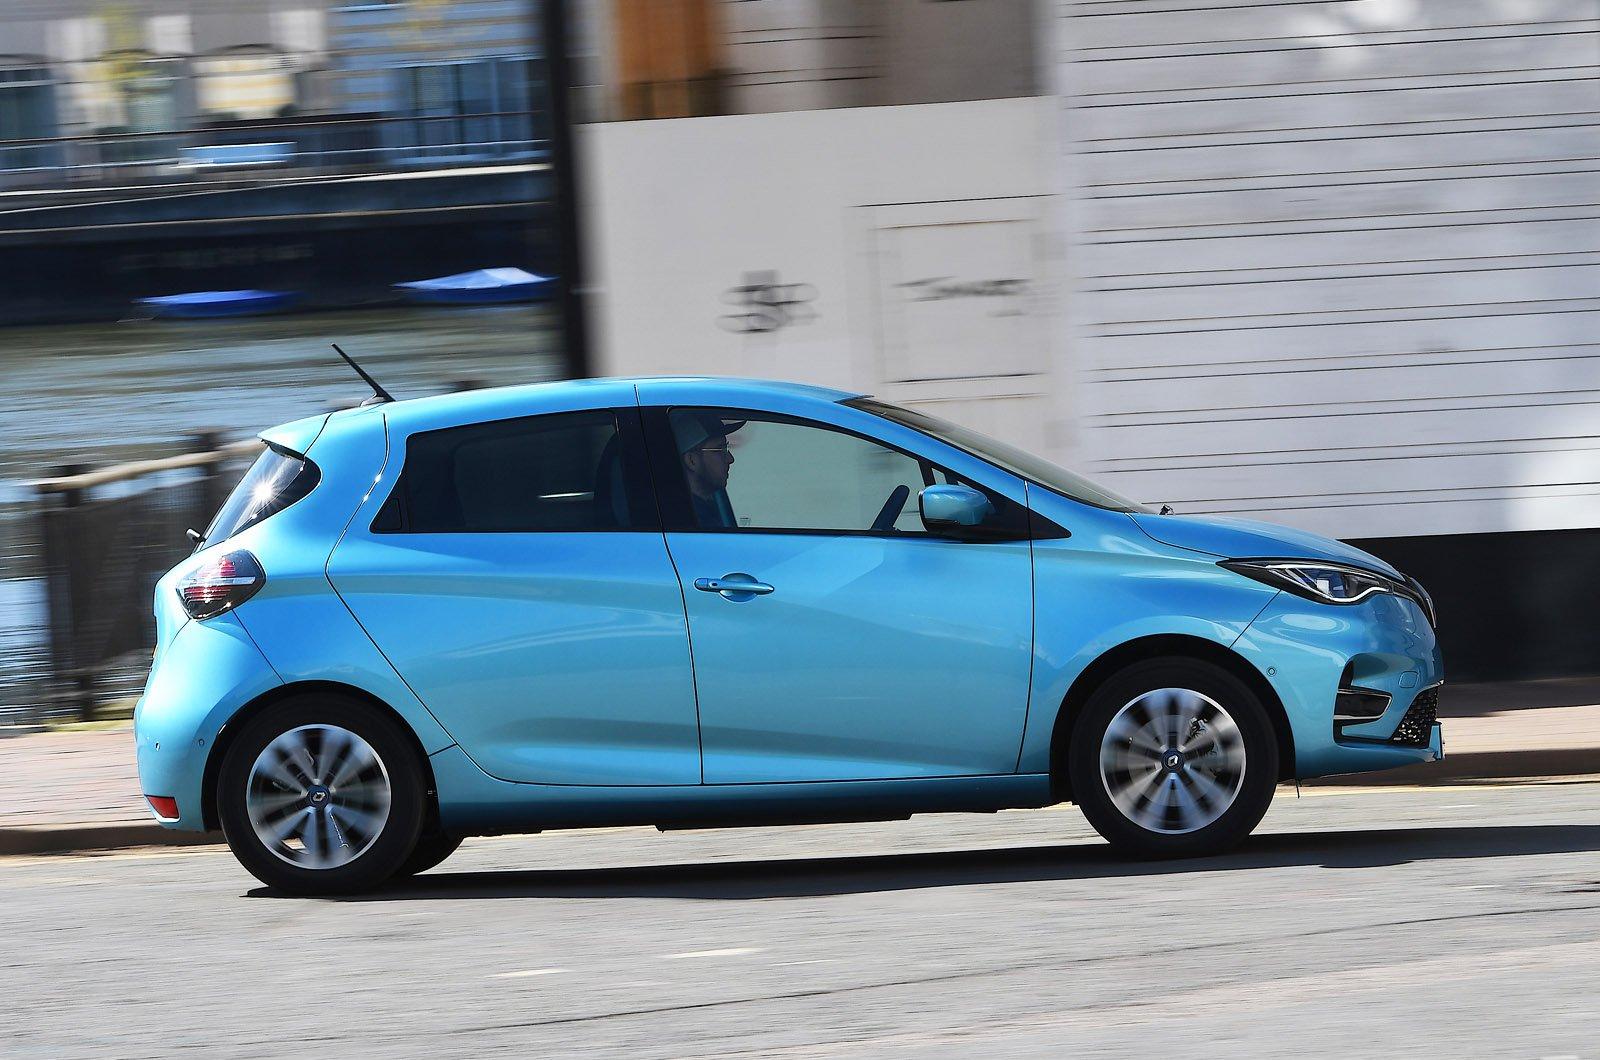 Renault Zoe side panning